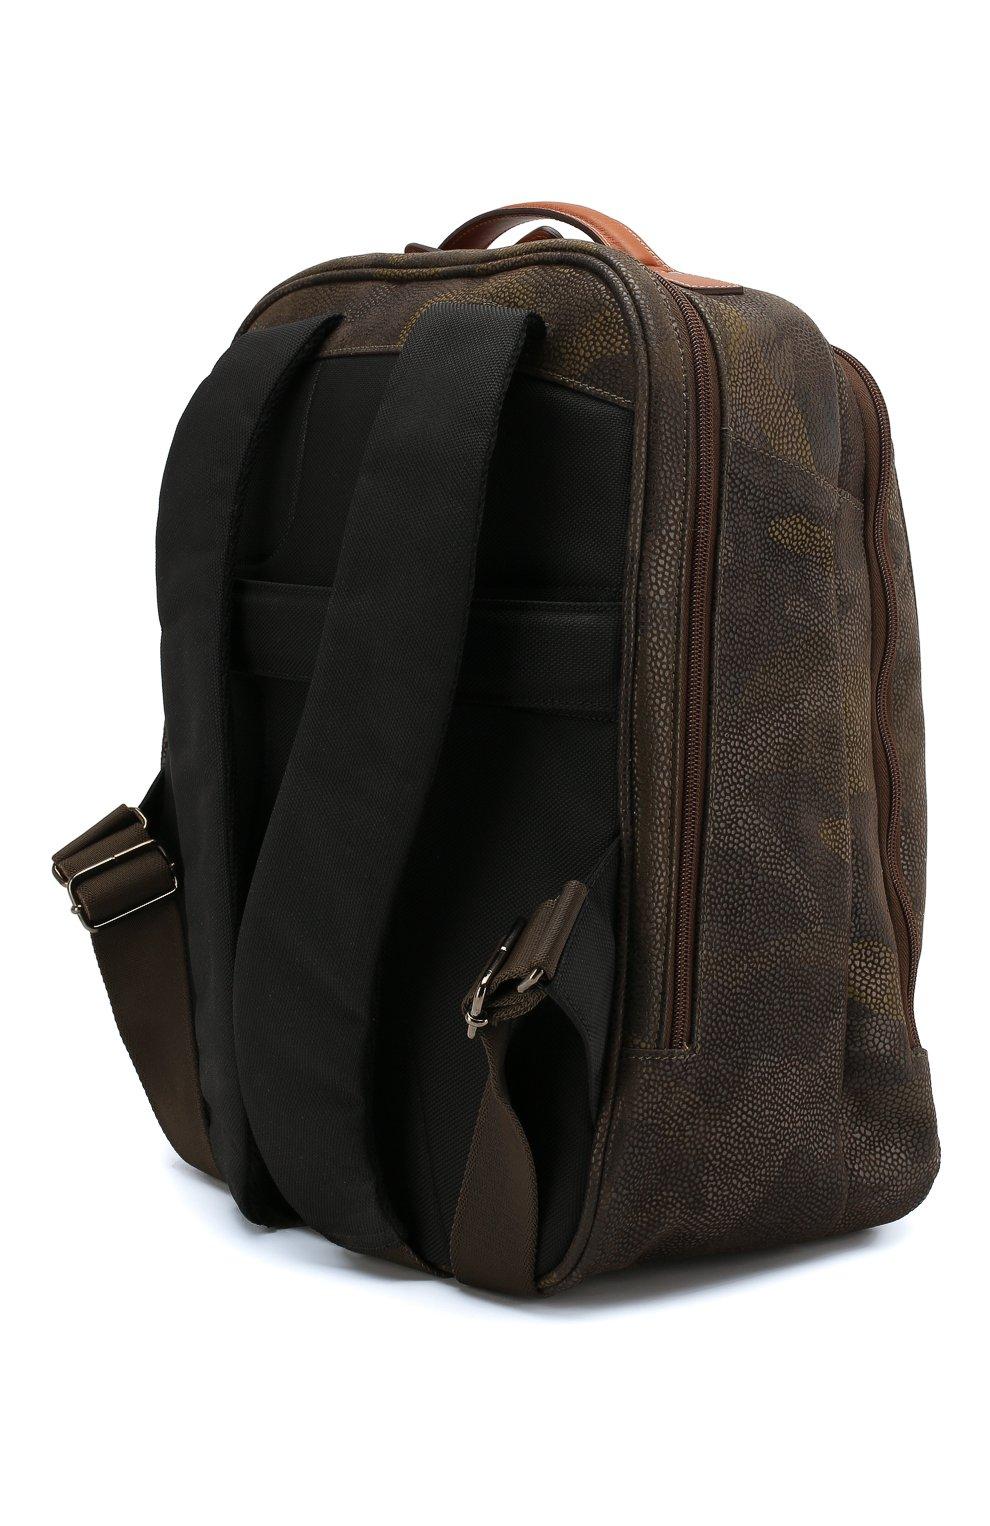 Женский дорожный рюкзак life BRIC`S оливкового цвета, арт. BL8 04658 | Фото 2